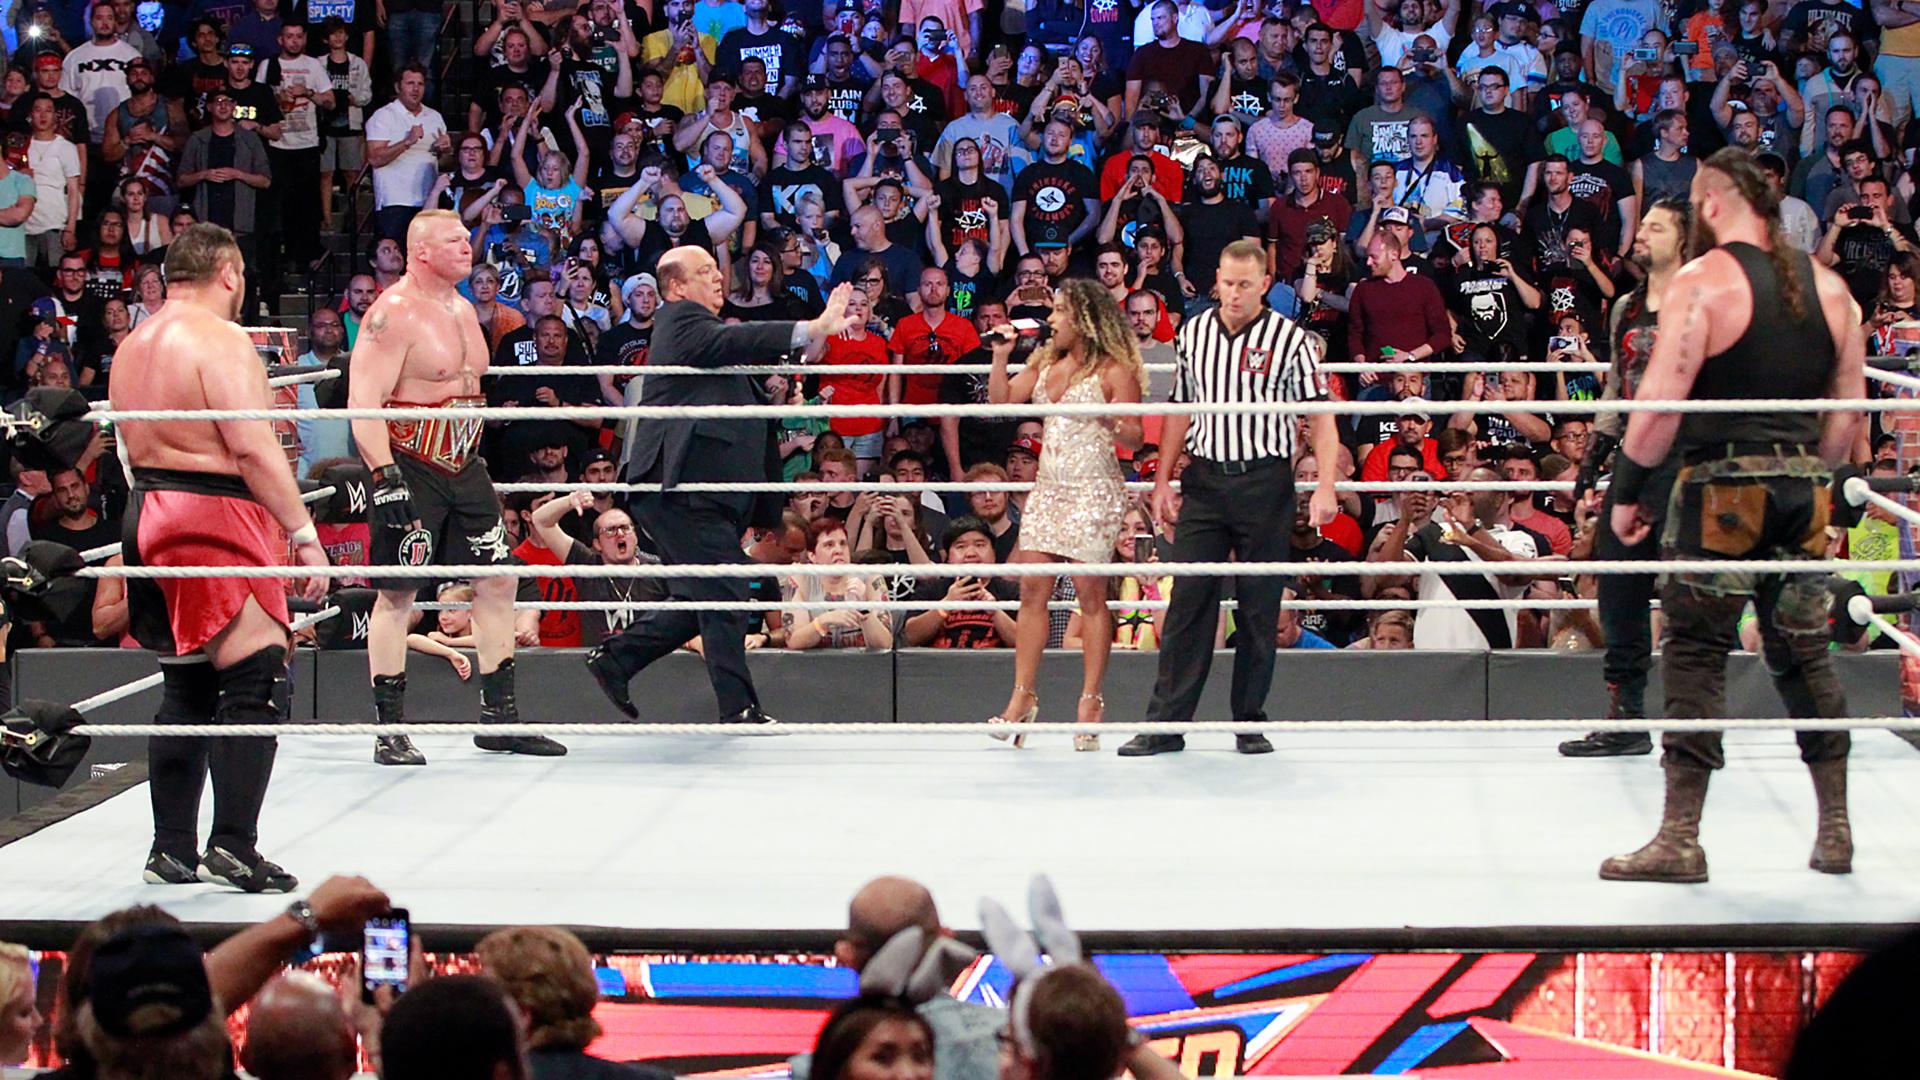 WWE Summerslam 2017 Review 08/20/2017